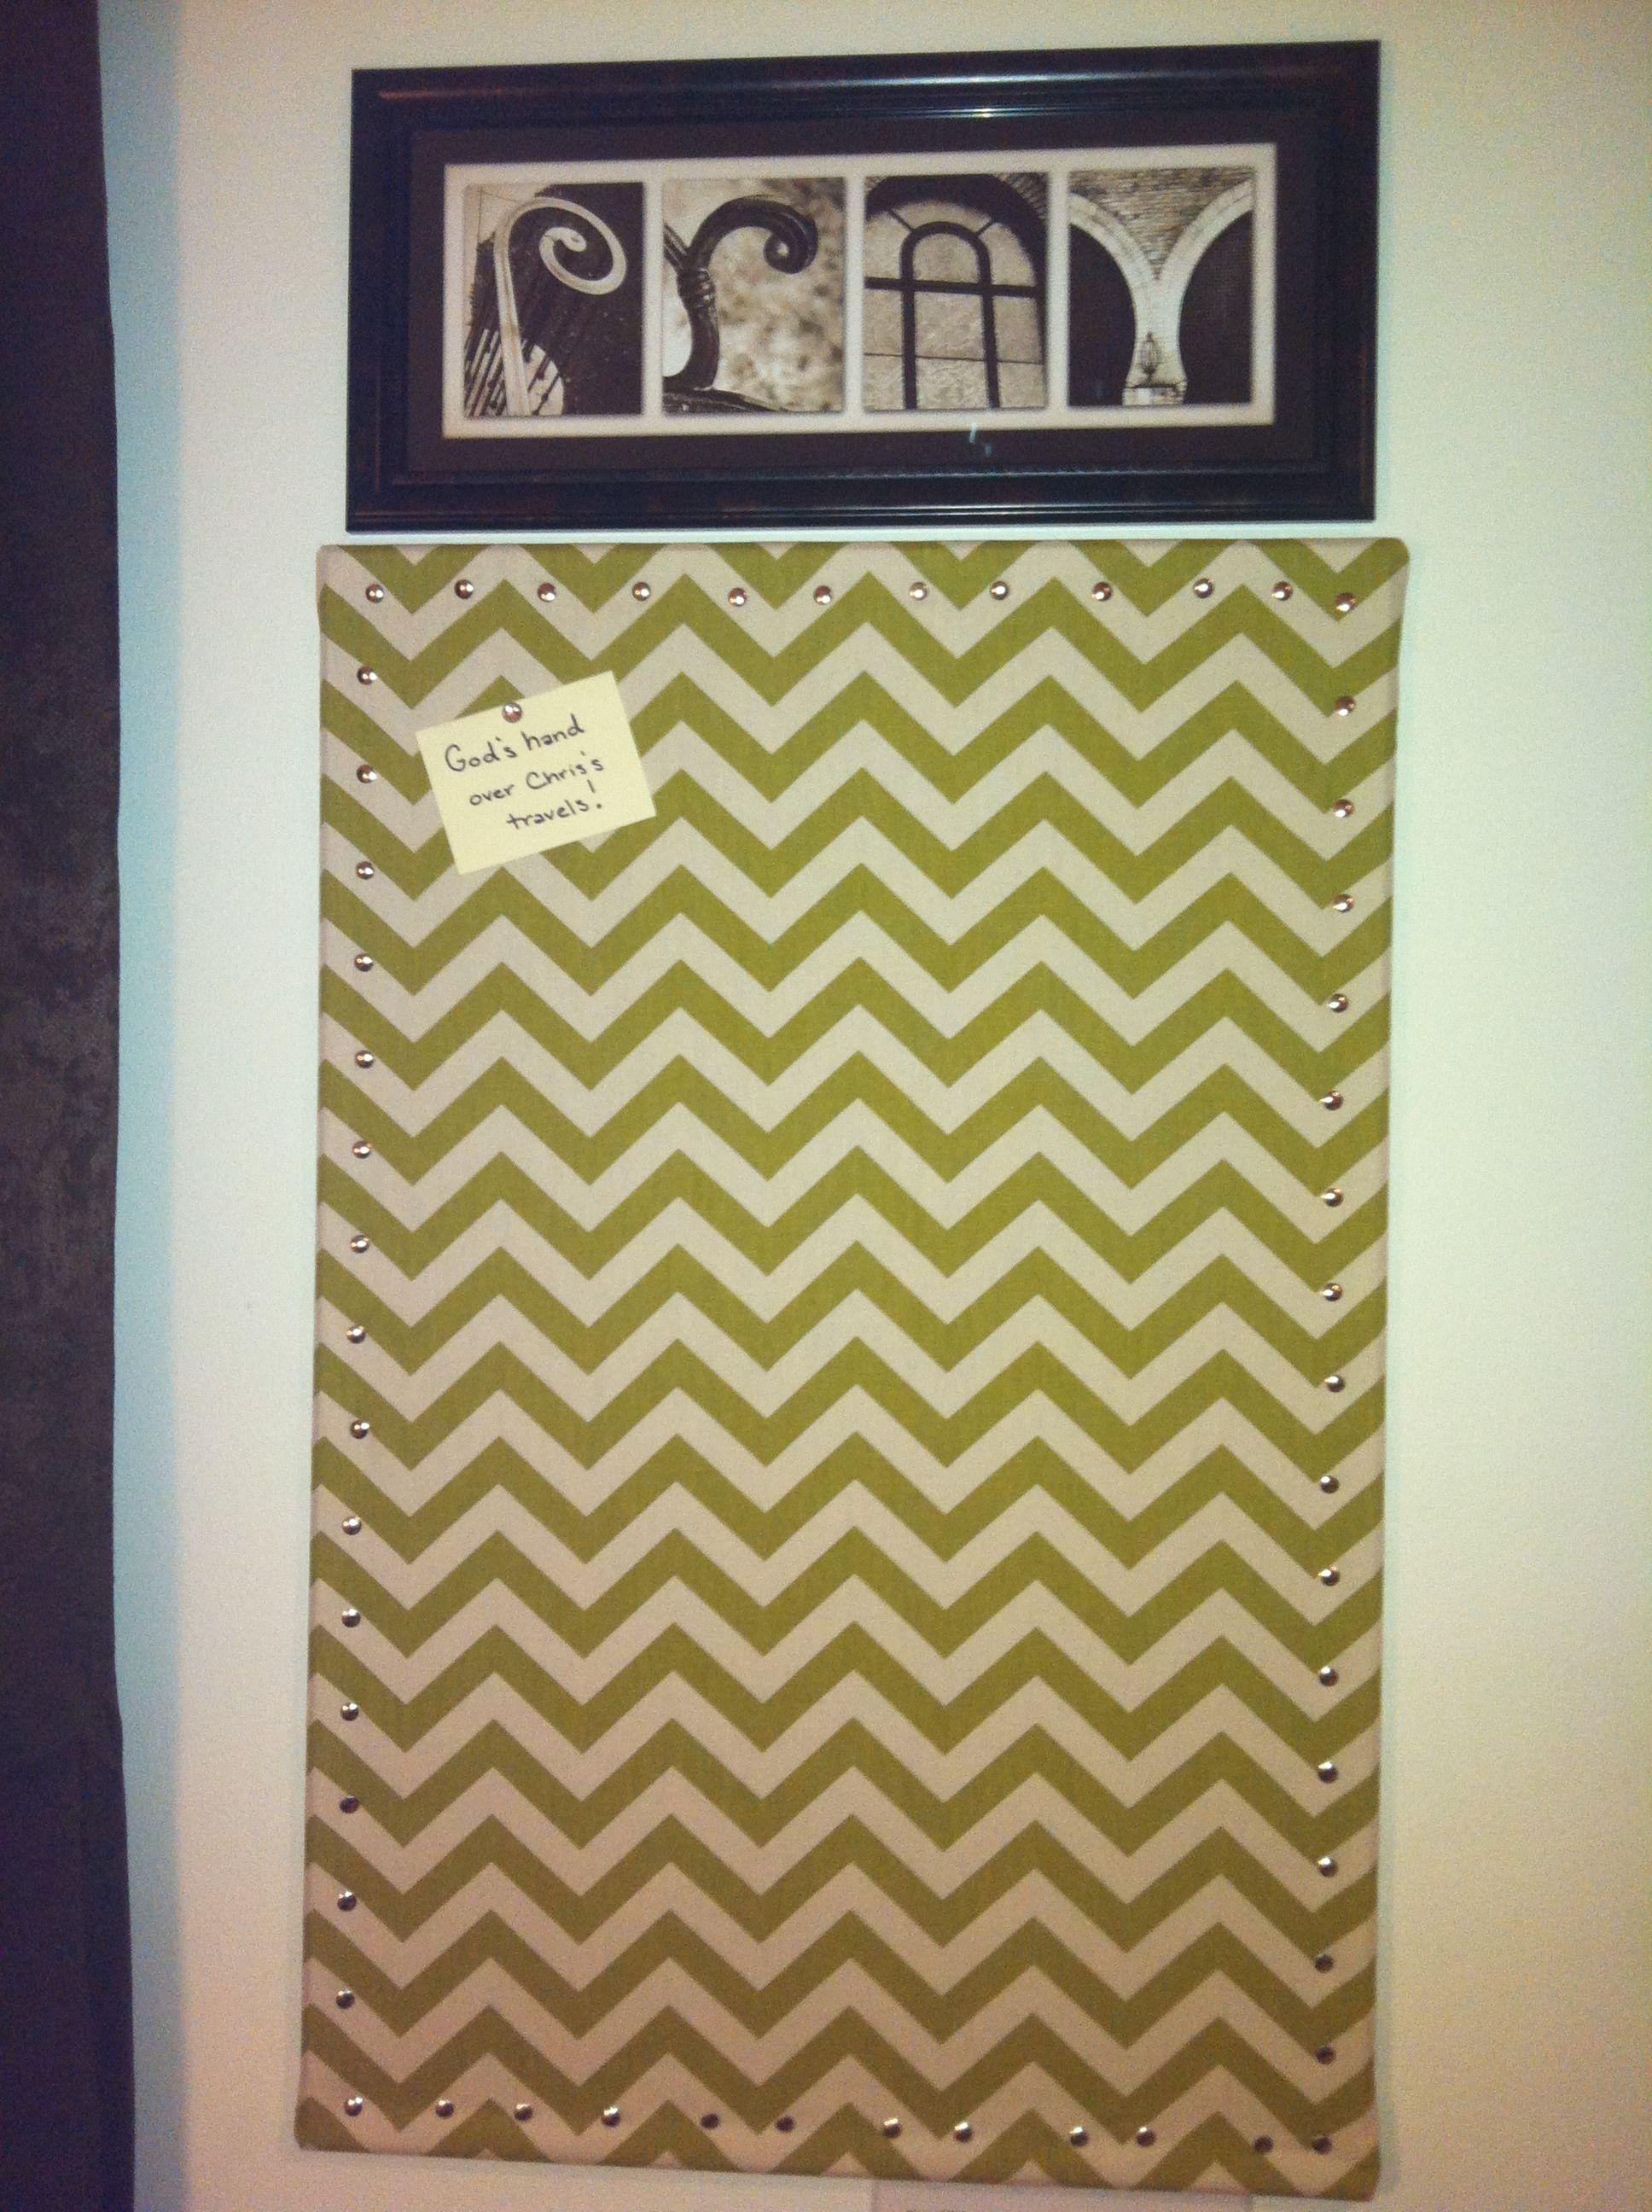 Prayer Board Cork board covered in chevron fabric Holly Lobby